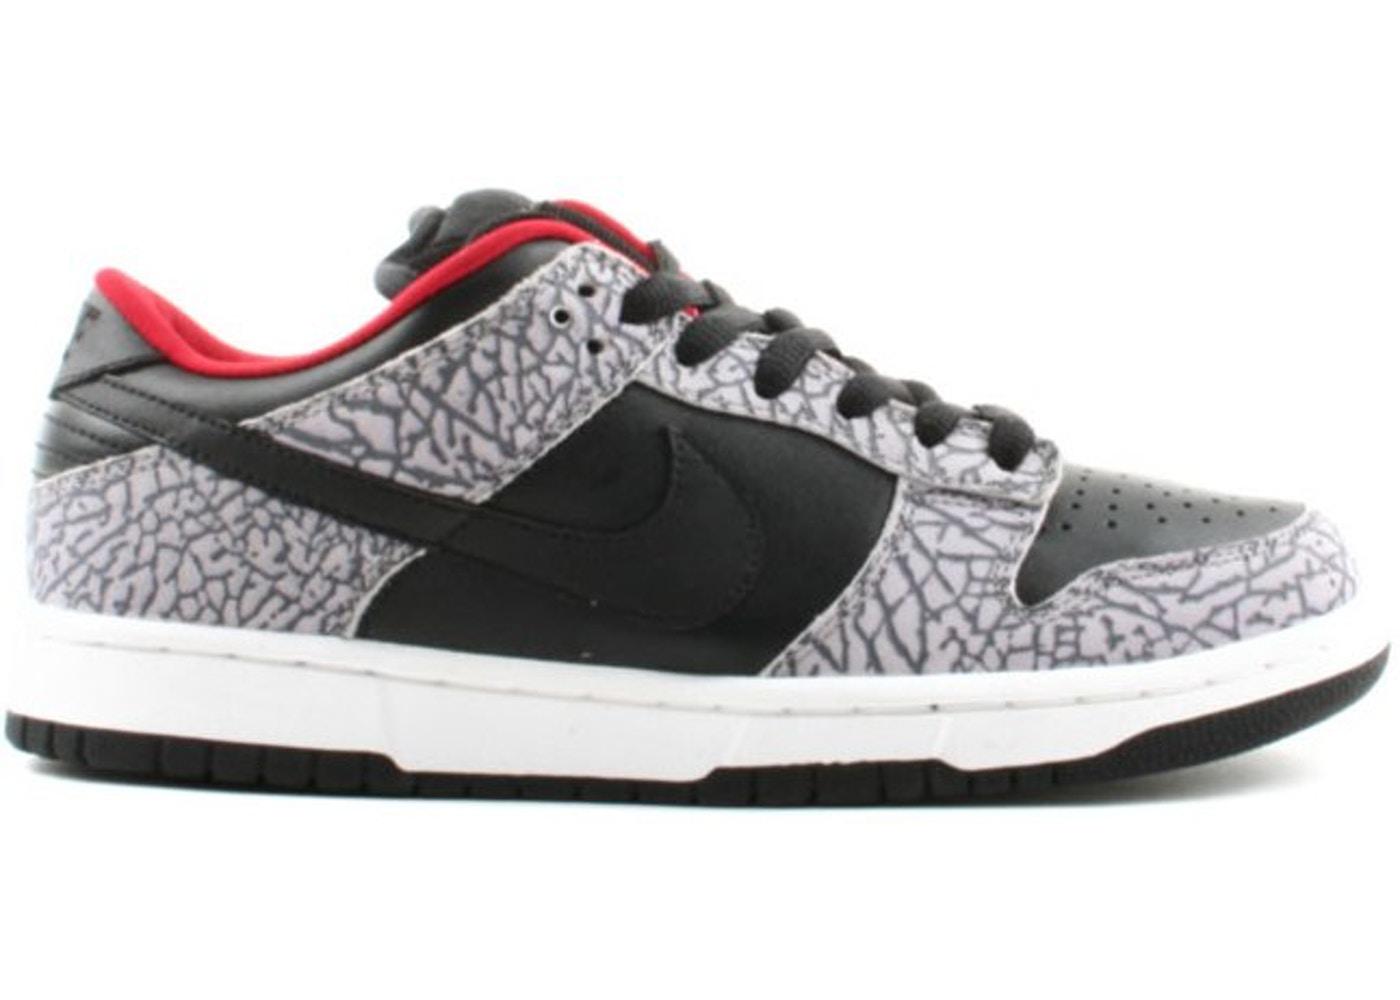 Nike-Dunk-SB-Low-Supreme-Black-Cement